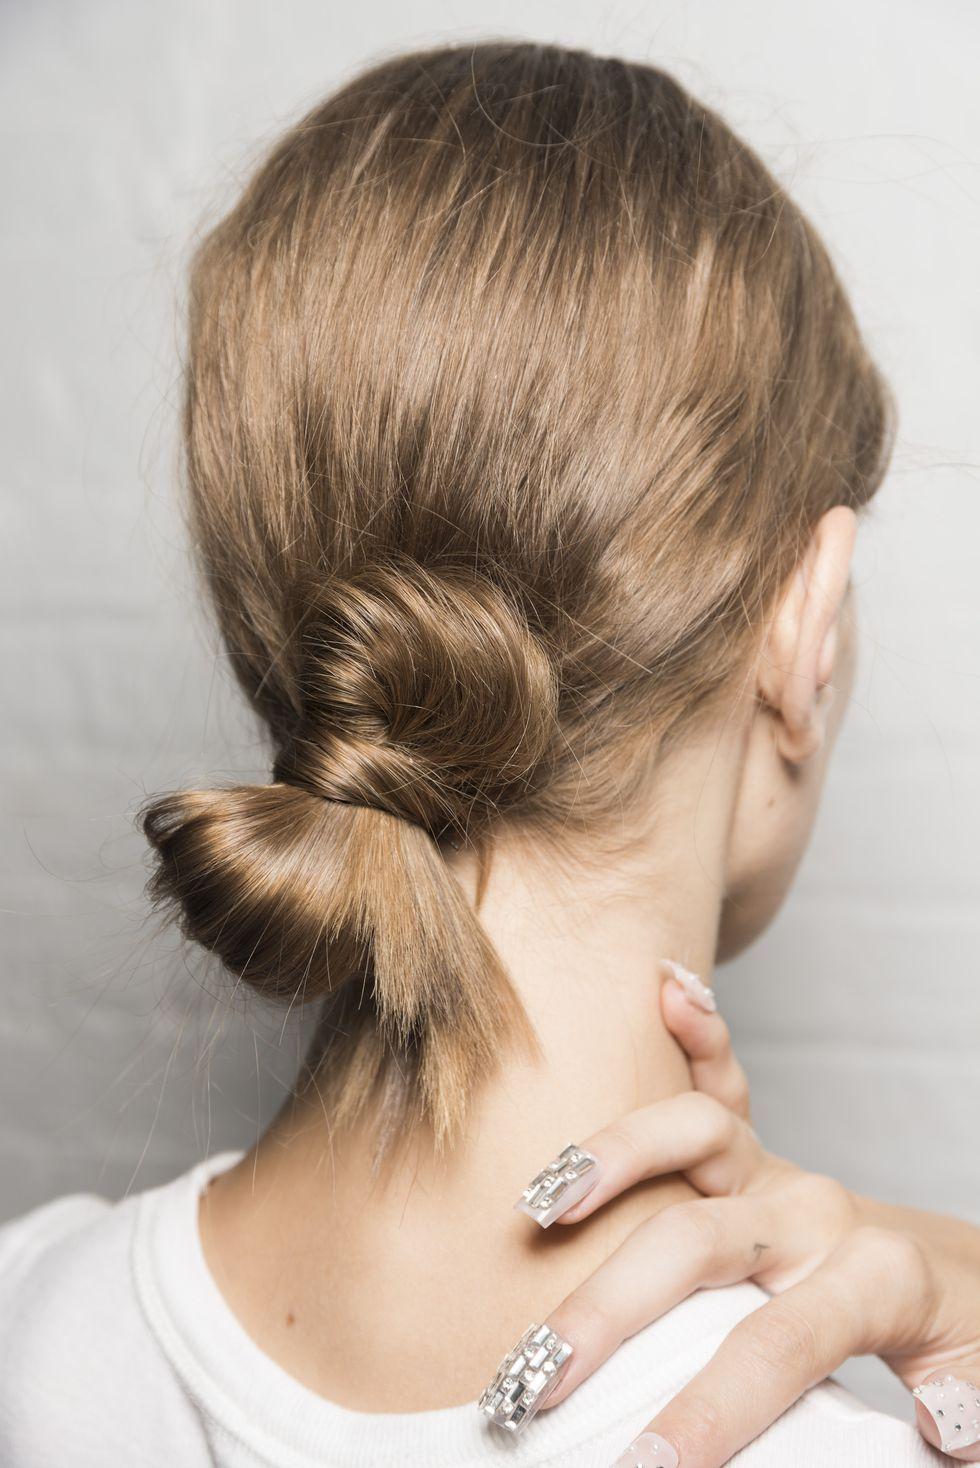 30 Wedding Guest Hairstyle Ideas Wedding Guest Hair Ideas Inspired